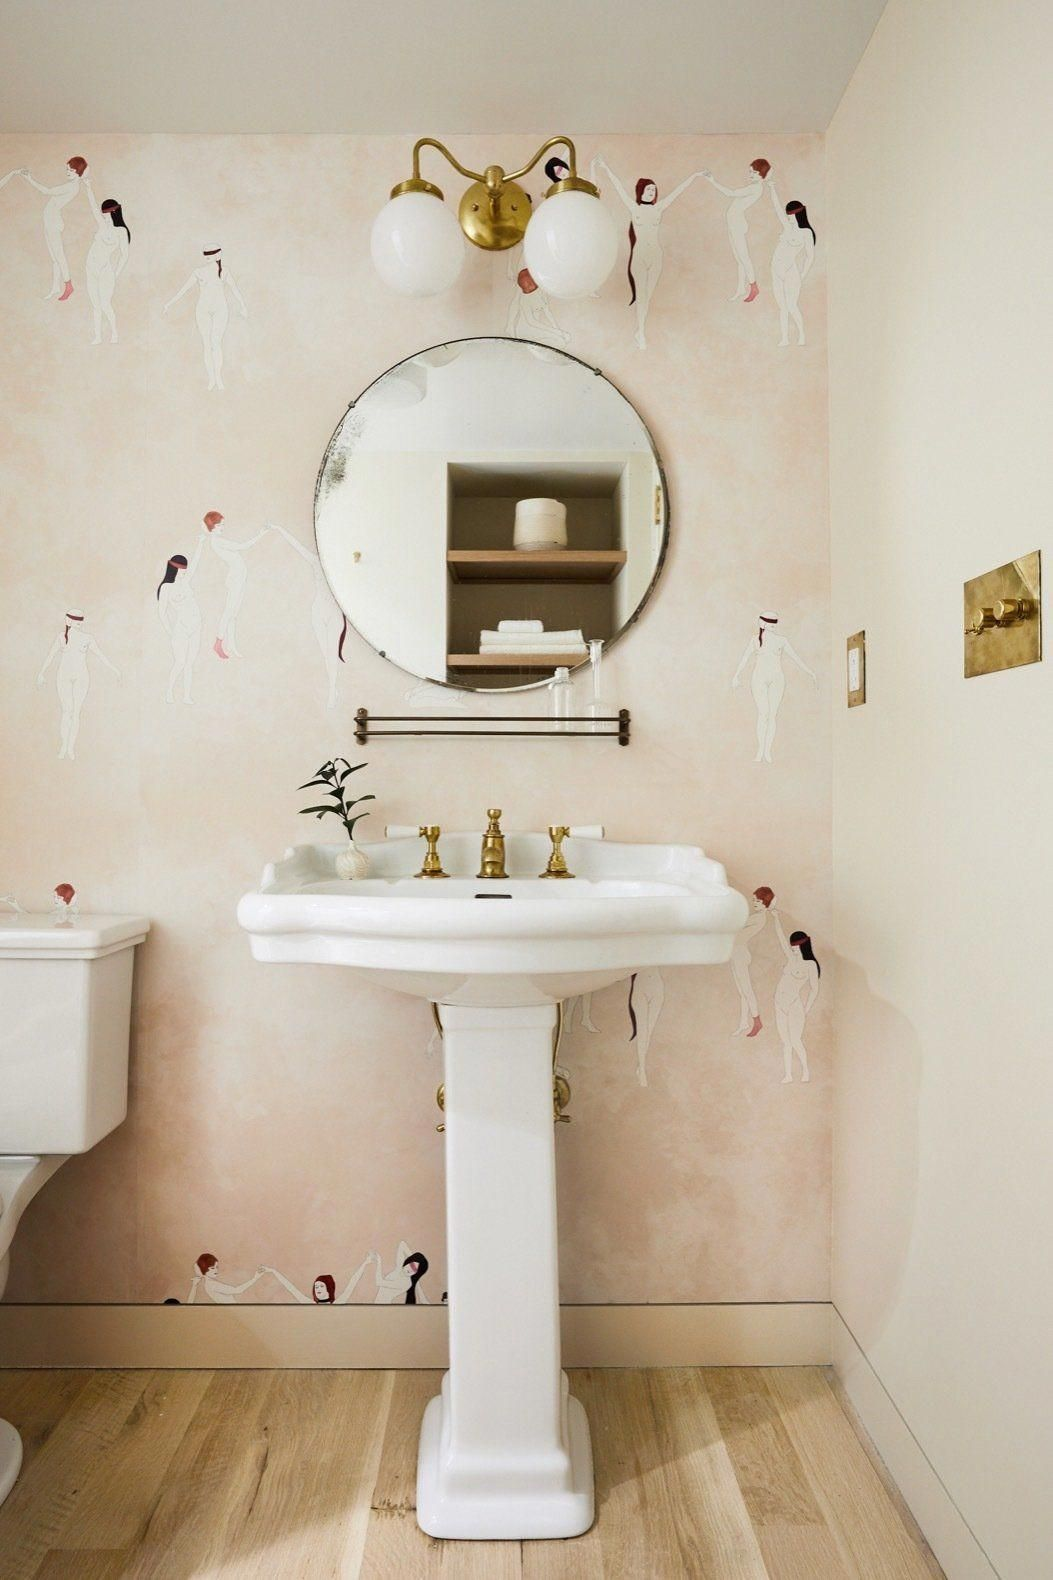 45 Hanging Bathroom Storage Ideas For Maximizing Your Bathroom Space Badezimmer Tapete Badezimmer Dekor Badezimmer Renovieren